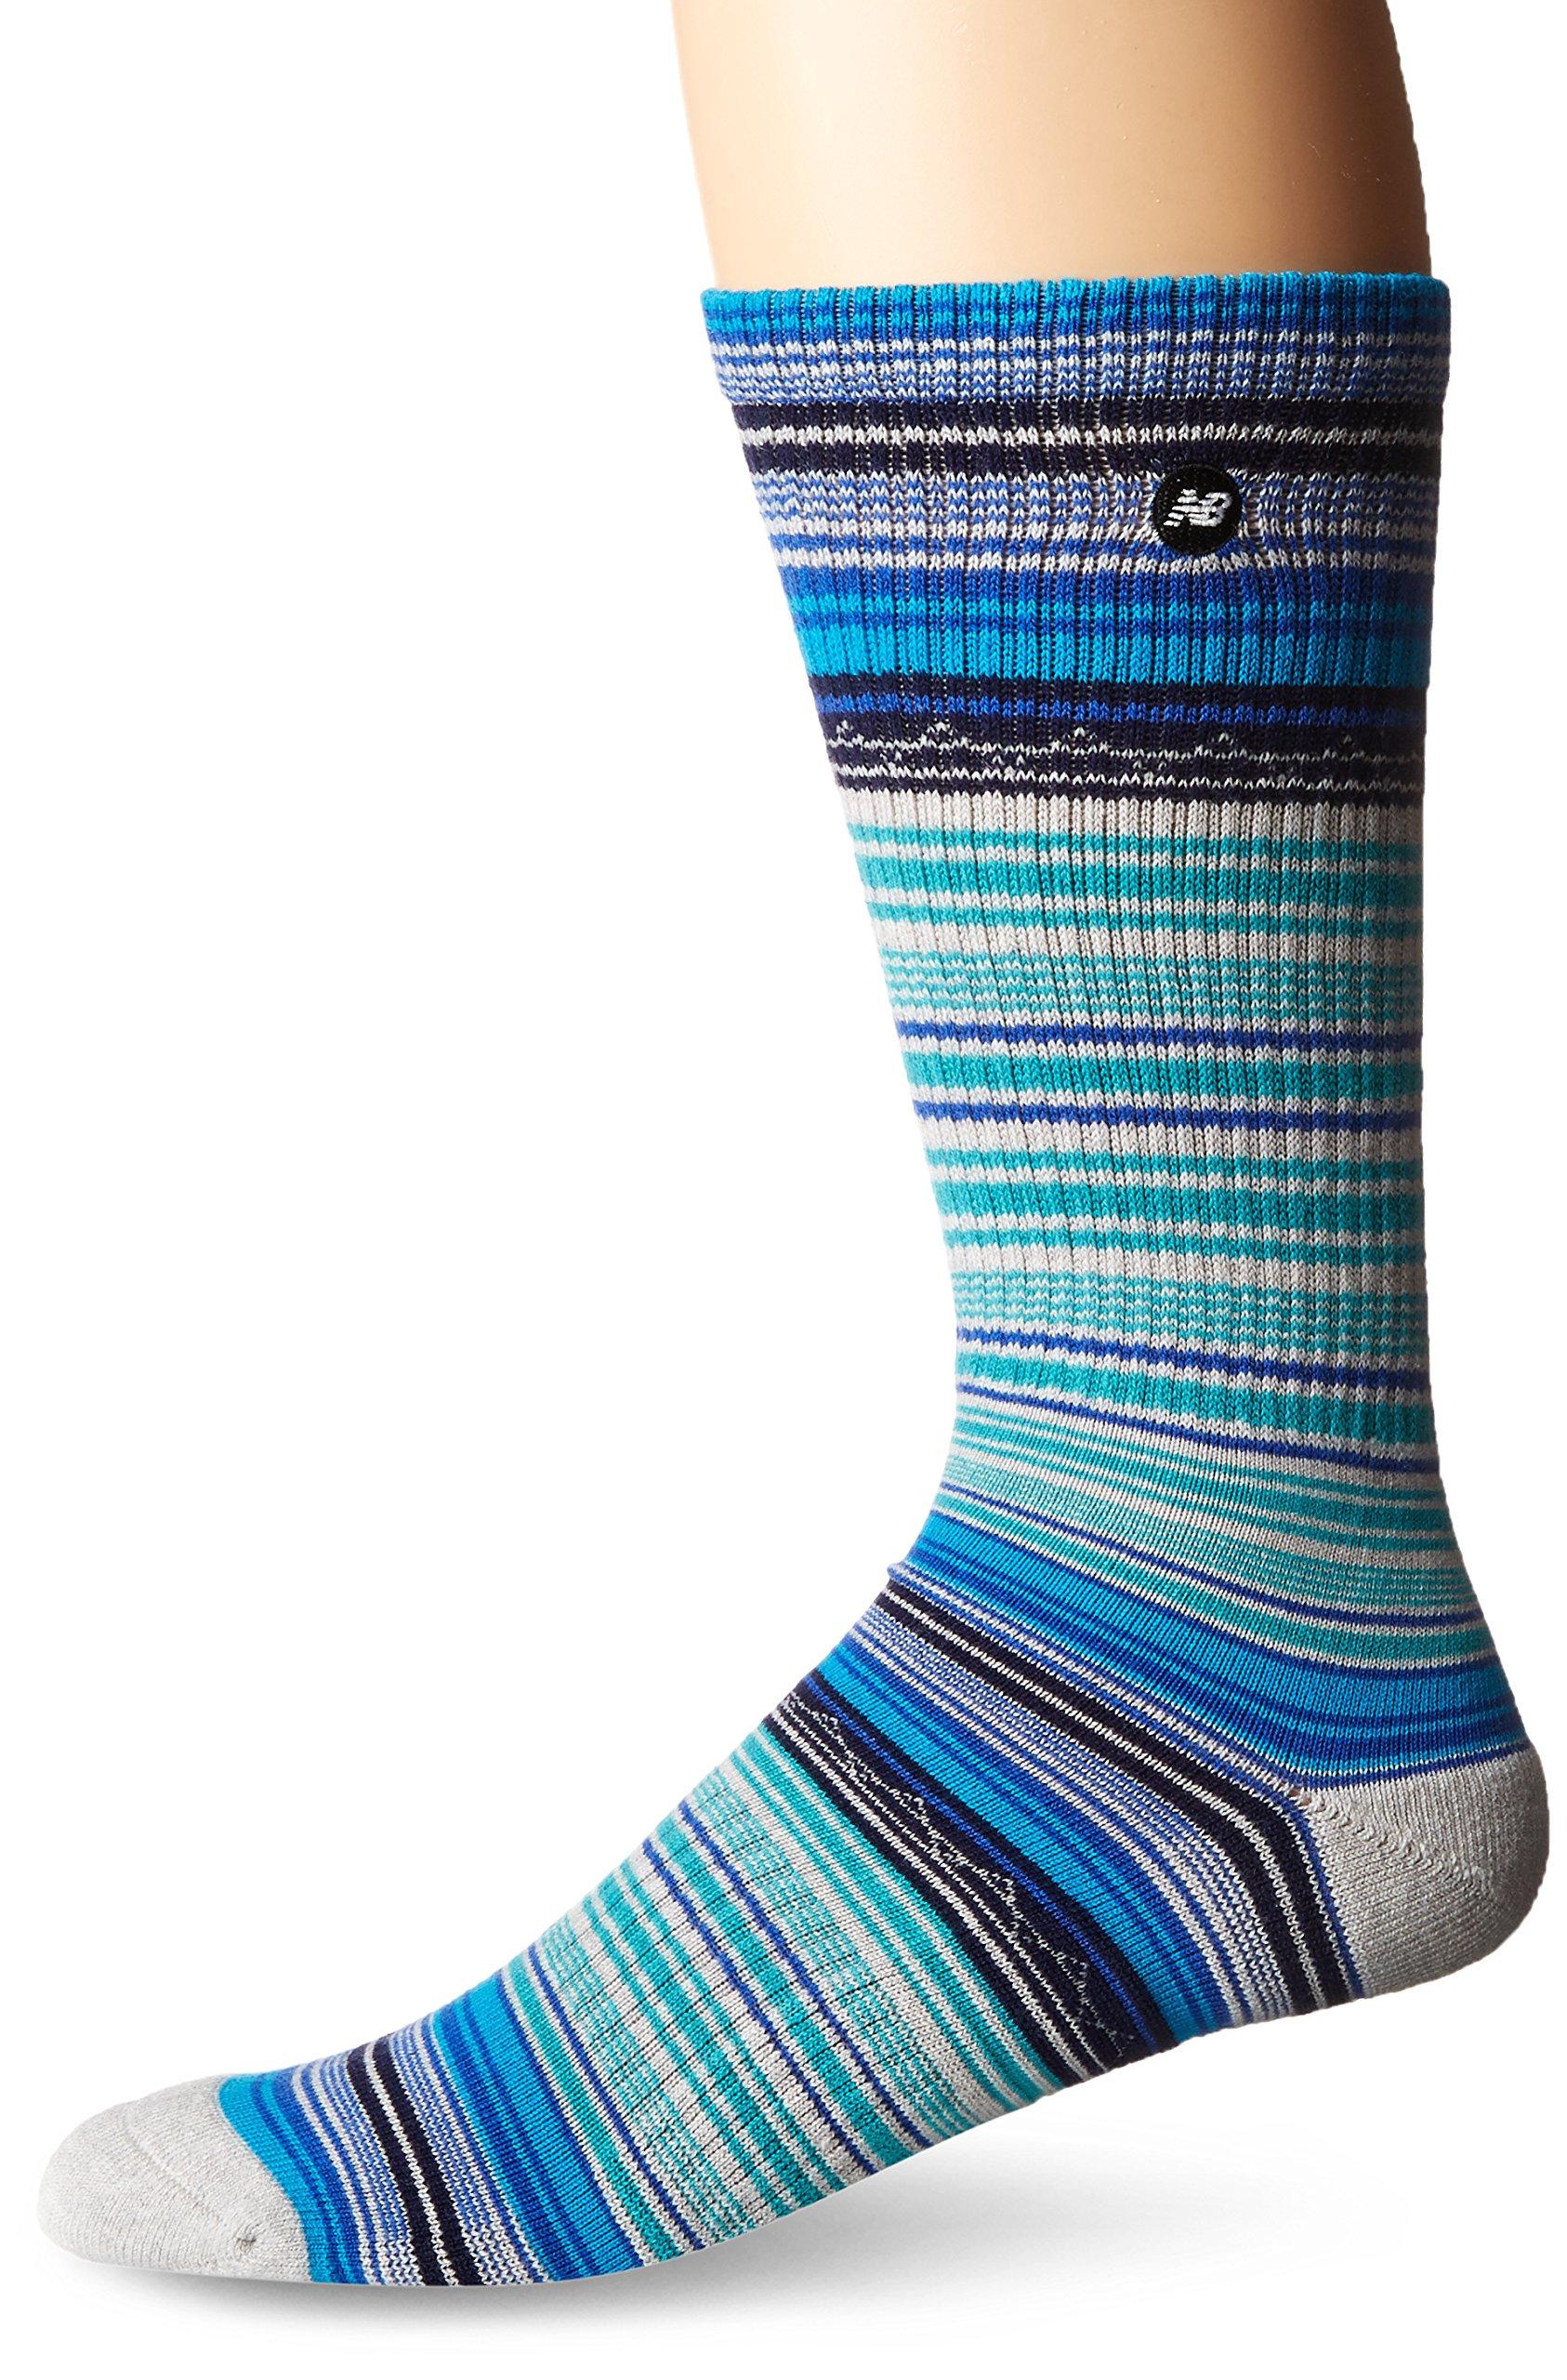 New Balance Lifestyle Striped Crew Socks